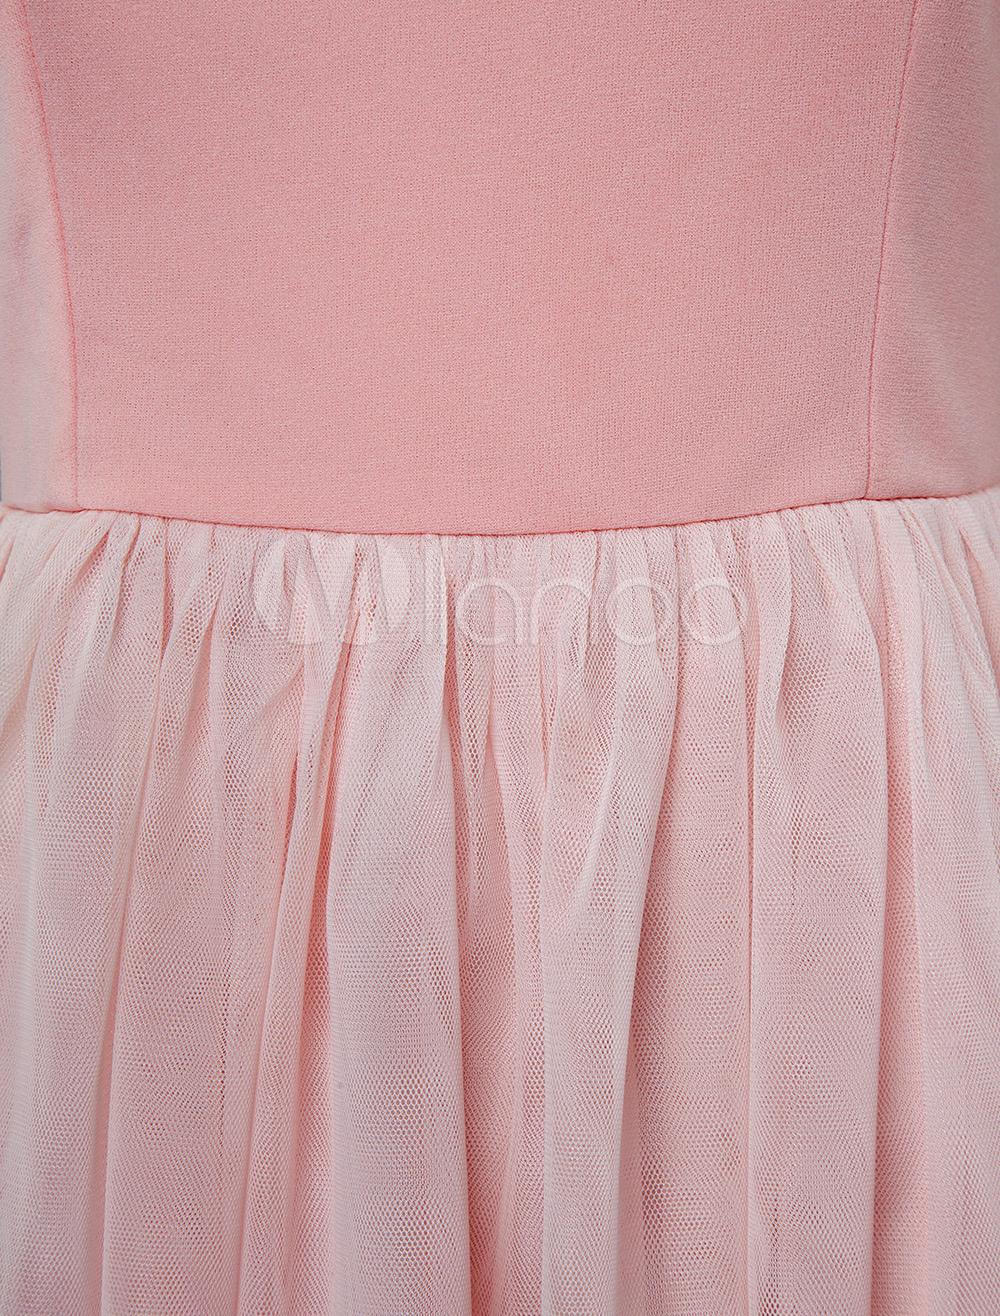 035994949c ... Pink Skater Dress Short Prom Dress Tulle Straps Women Flared Homecoming  Dress-No.9 ...